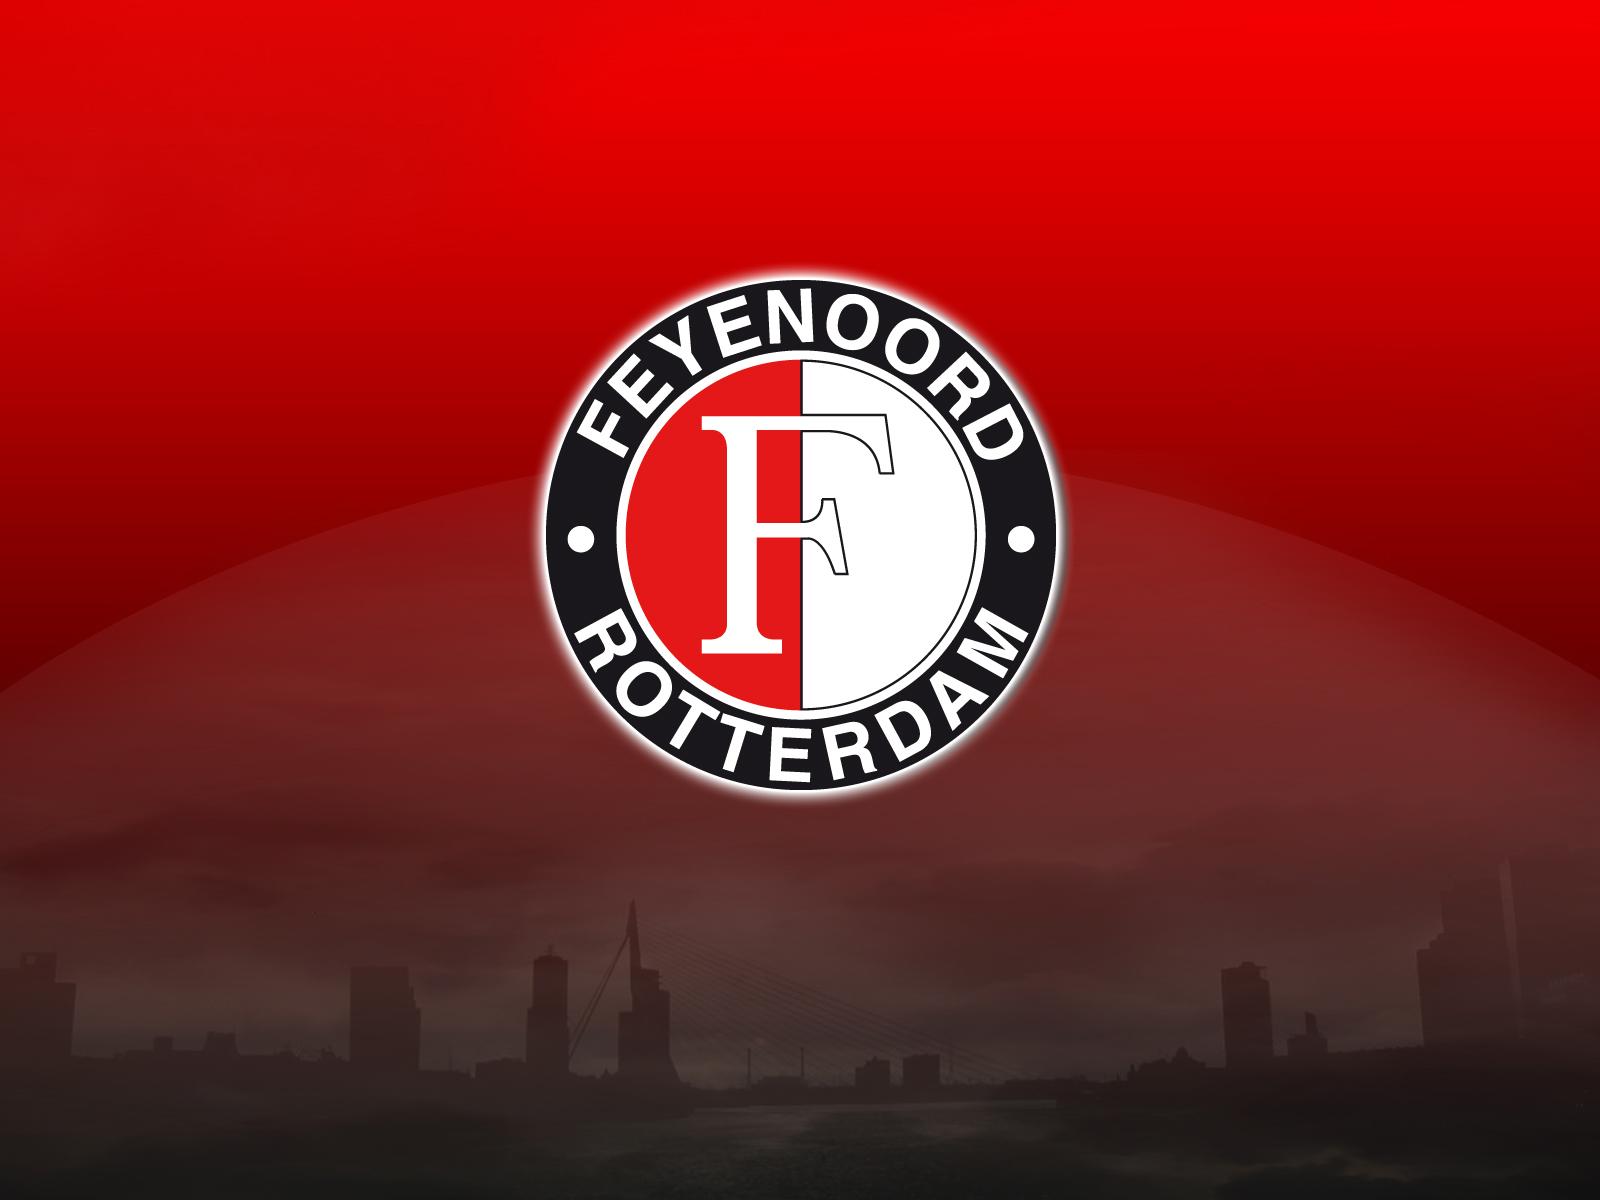 High Resolution Wallpaper | Feyenoord 1600x1200 px